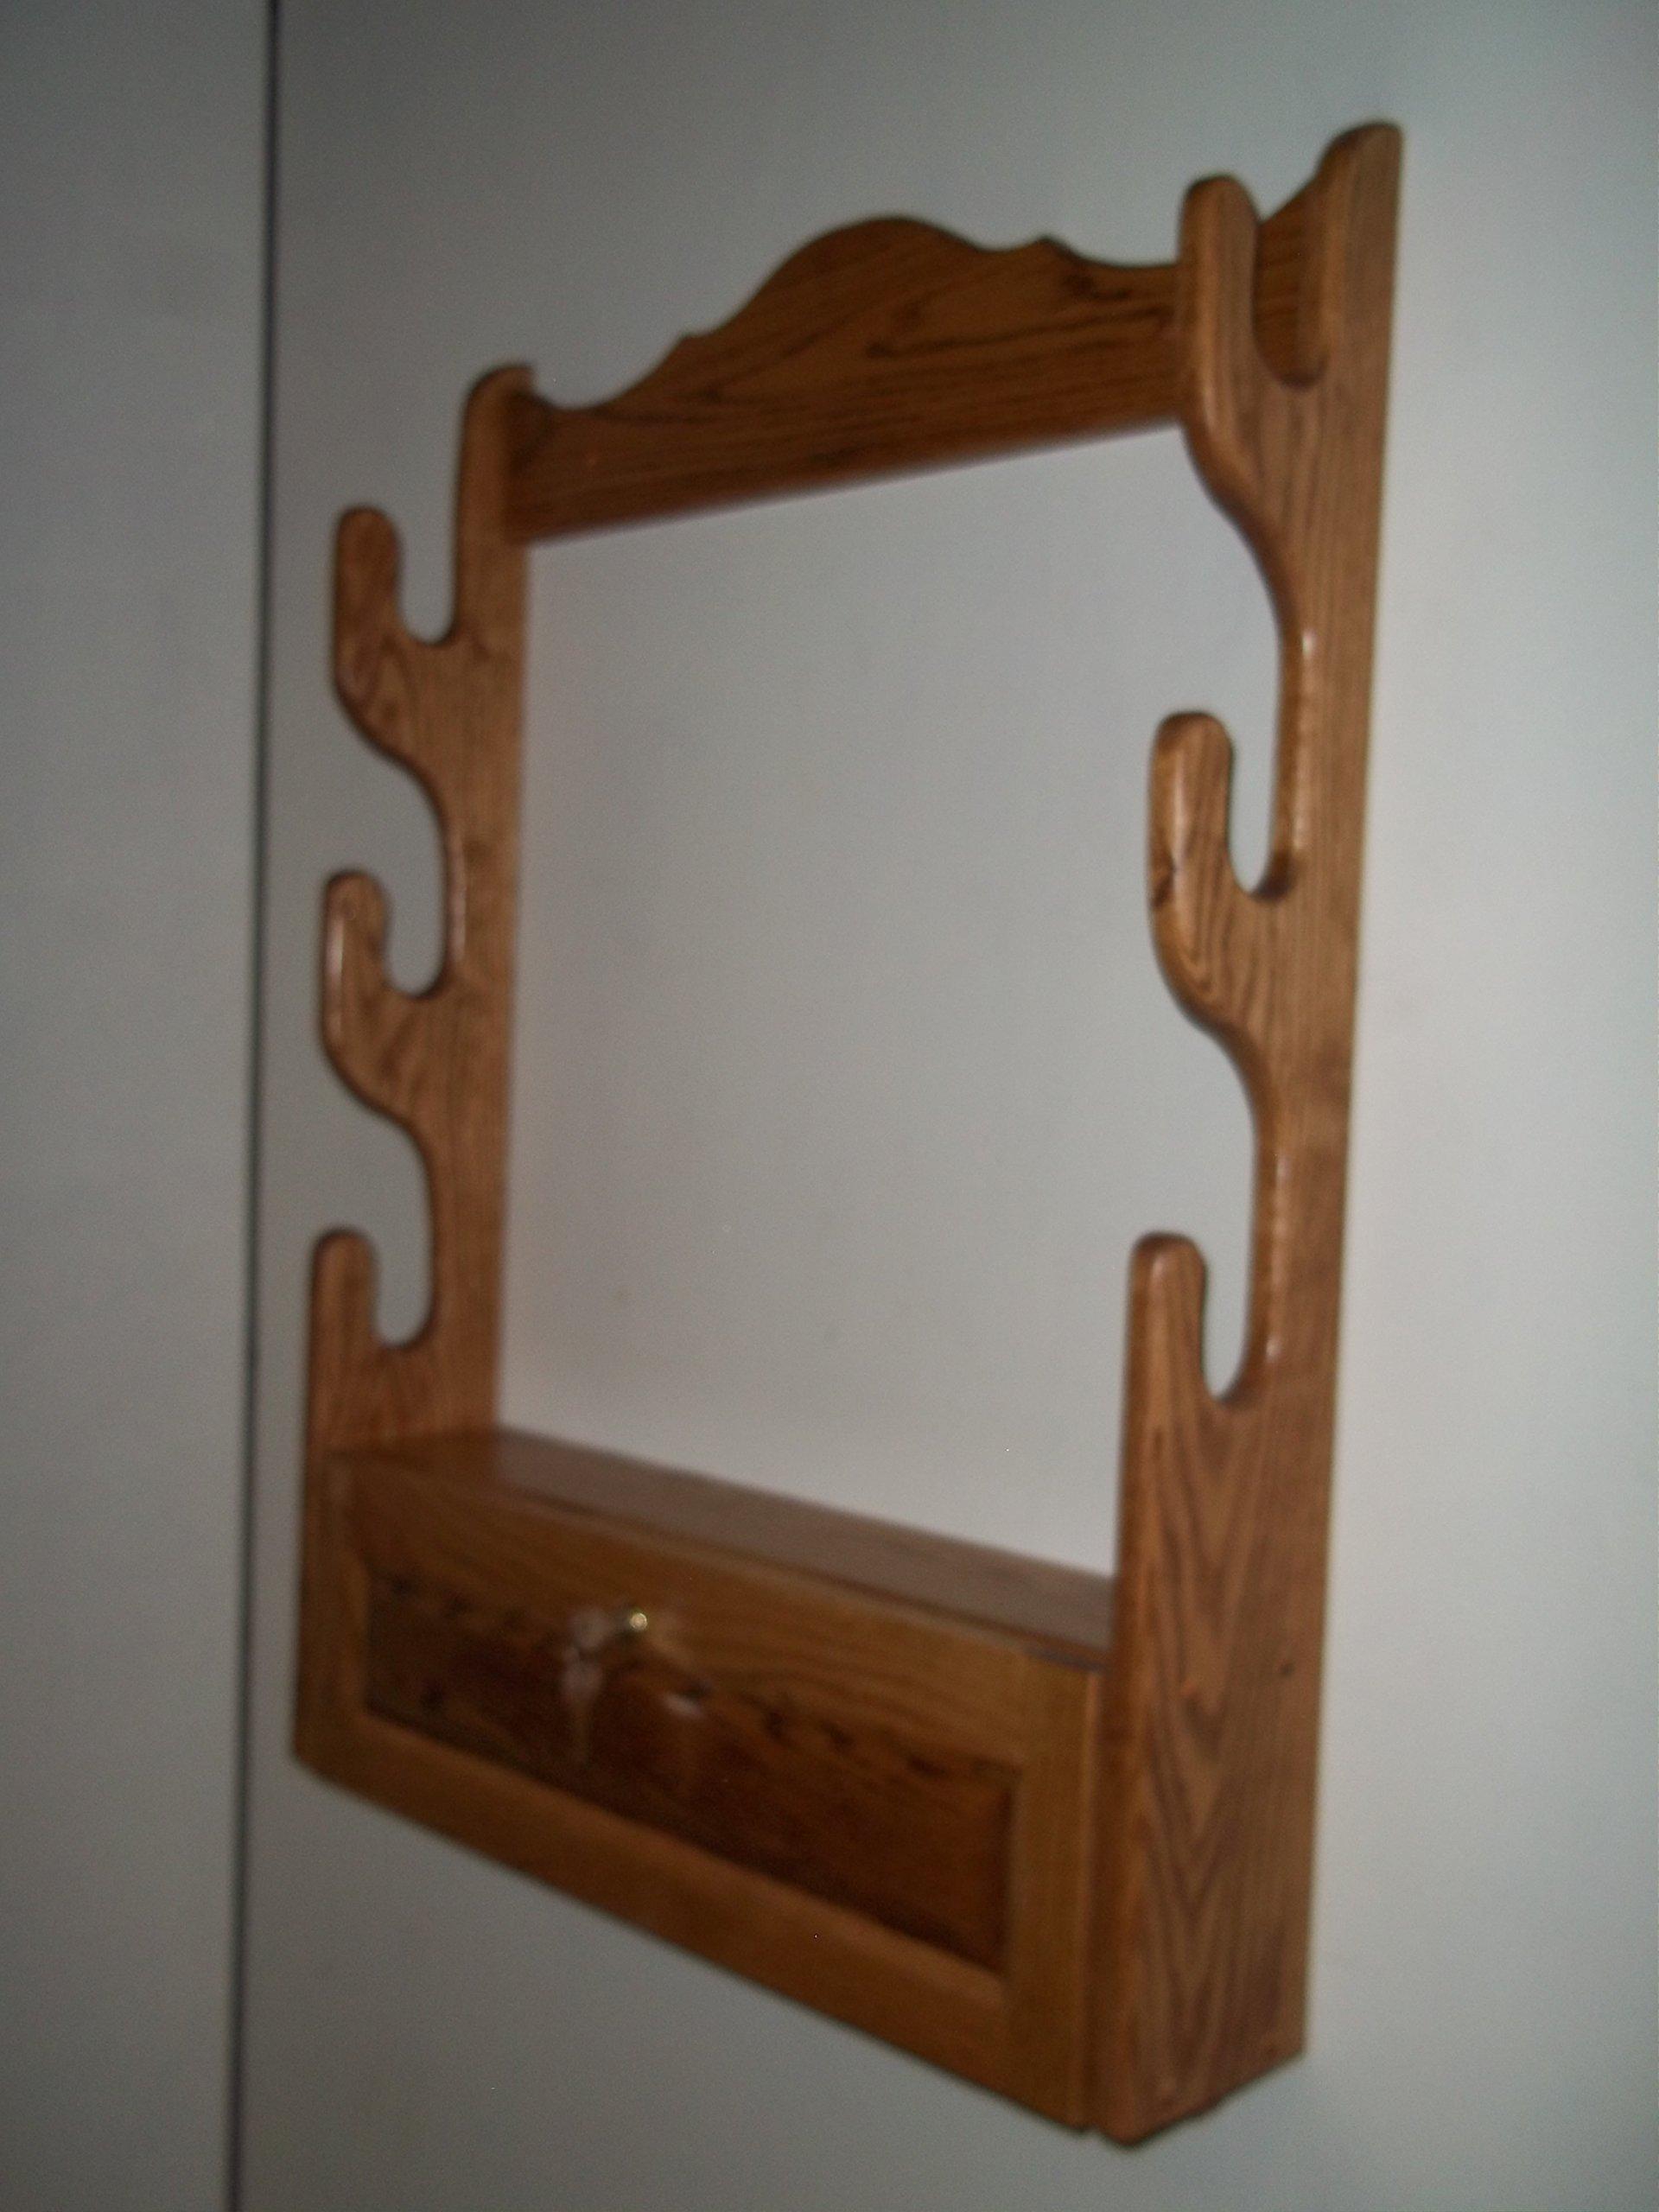 3 Gun Rack with Locking Storage Compartment ~ Golden Oak Finish